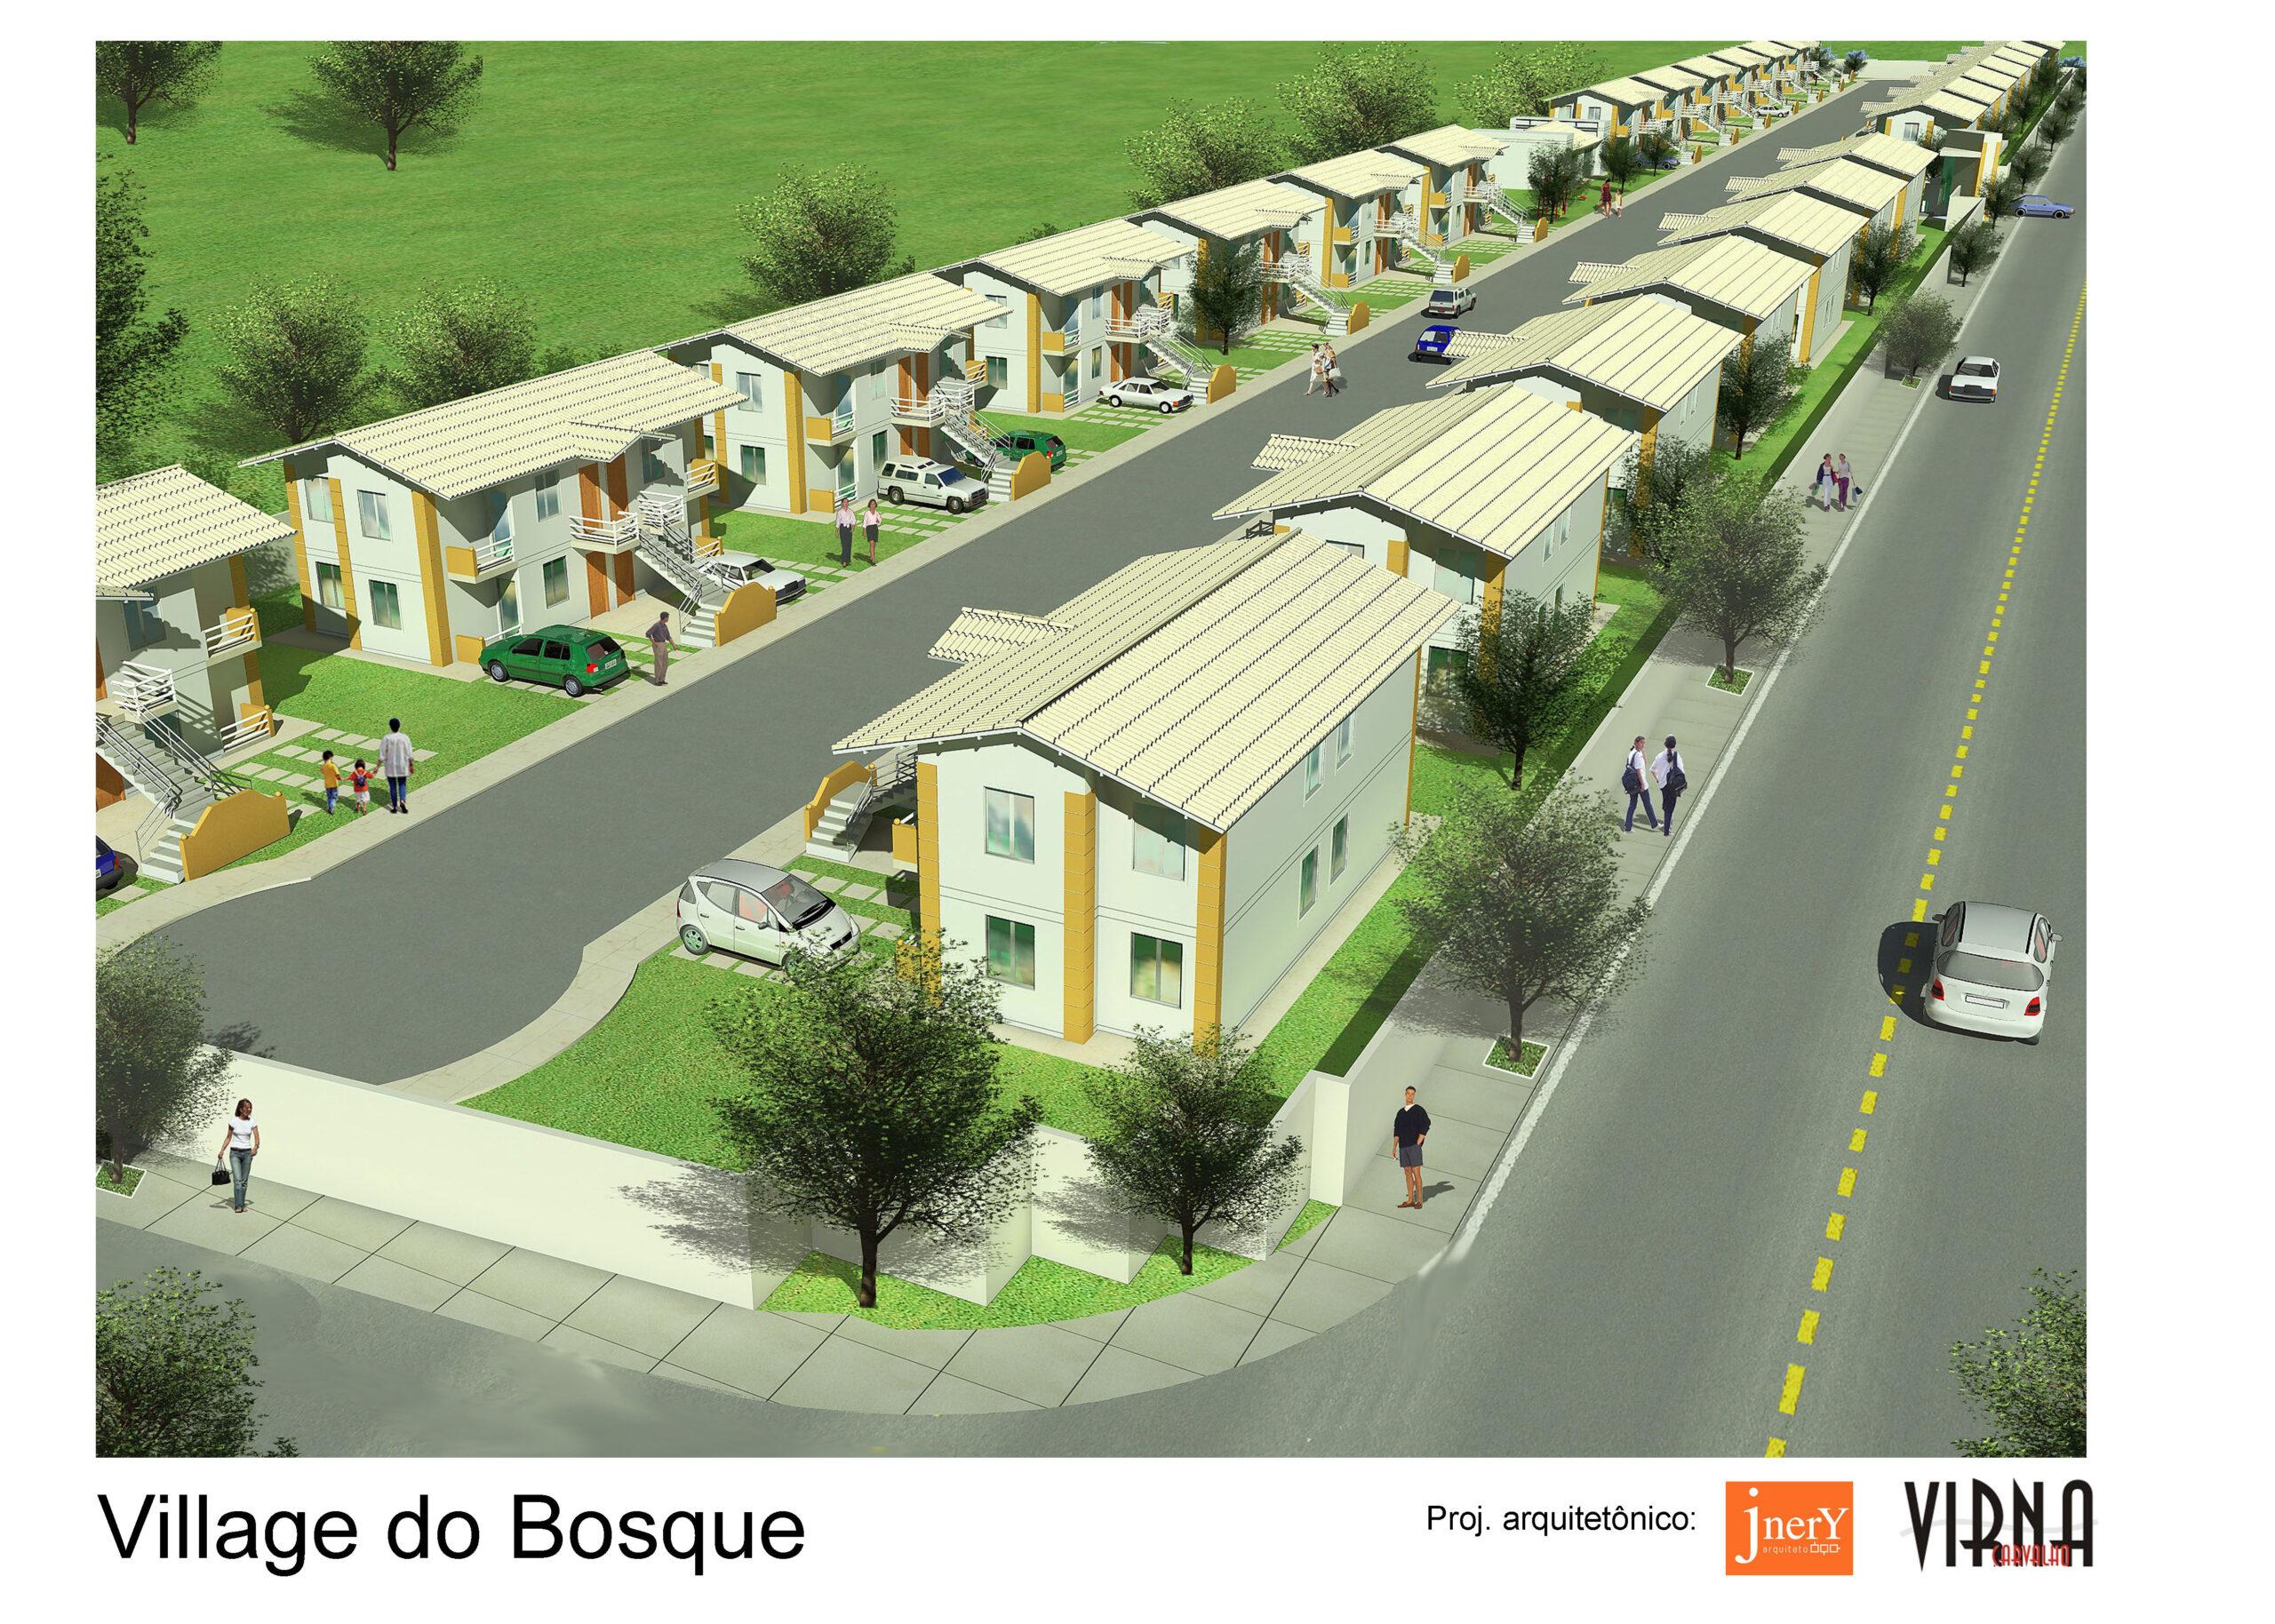 urbanismo-condominio-casas-ruas